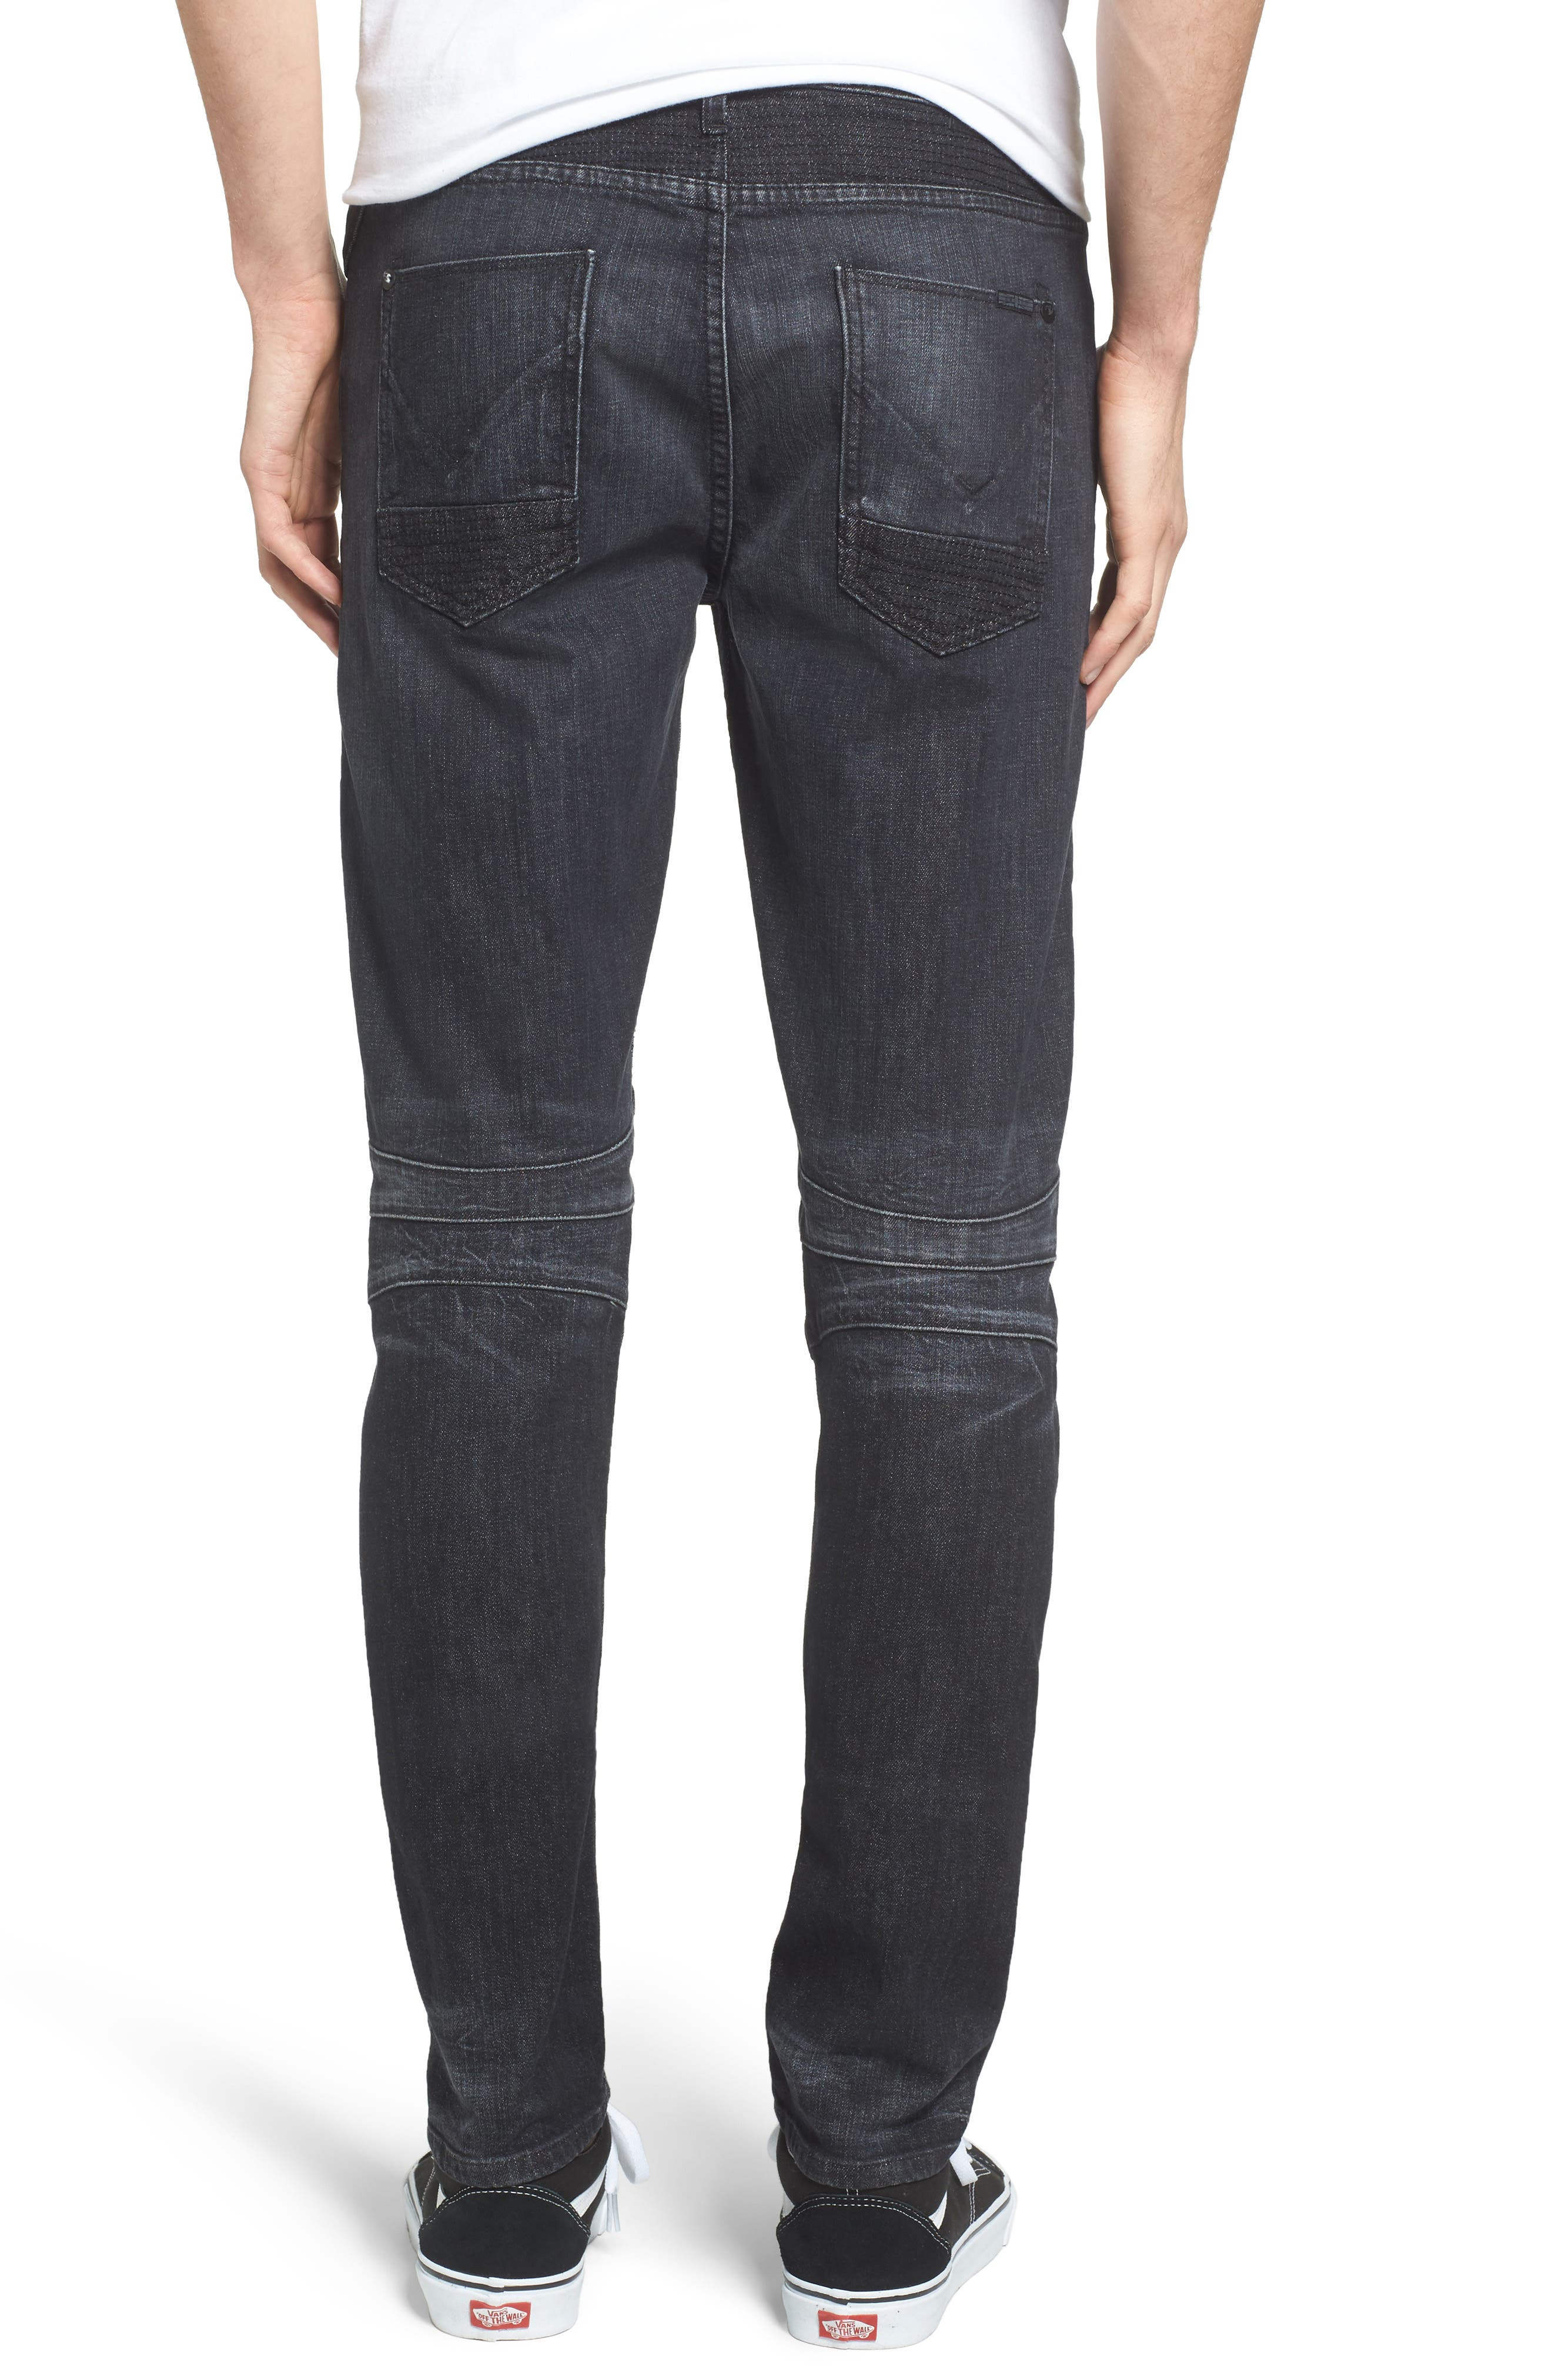 Blinder Skinny Fit Moto Jeans,                             Alternate thumbnail 2, color,                             001